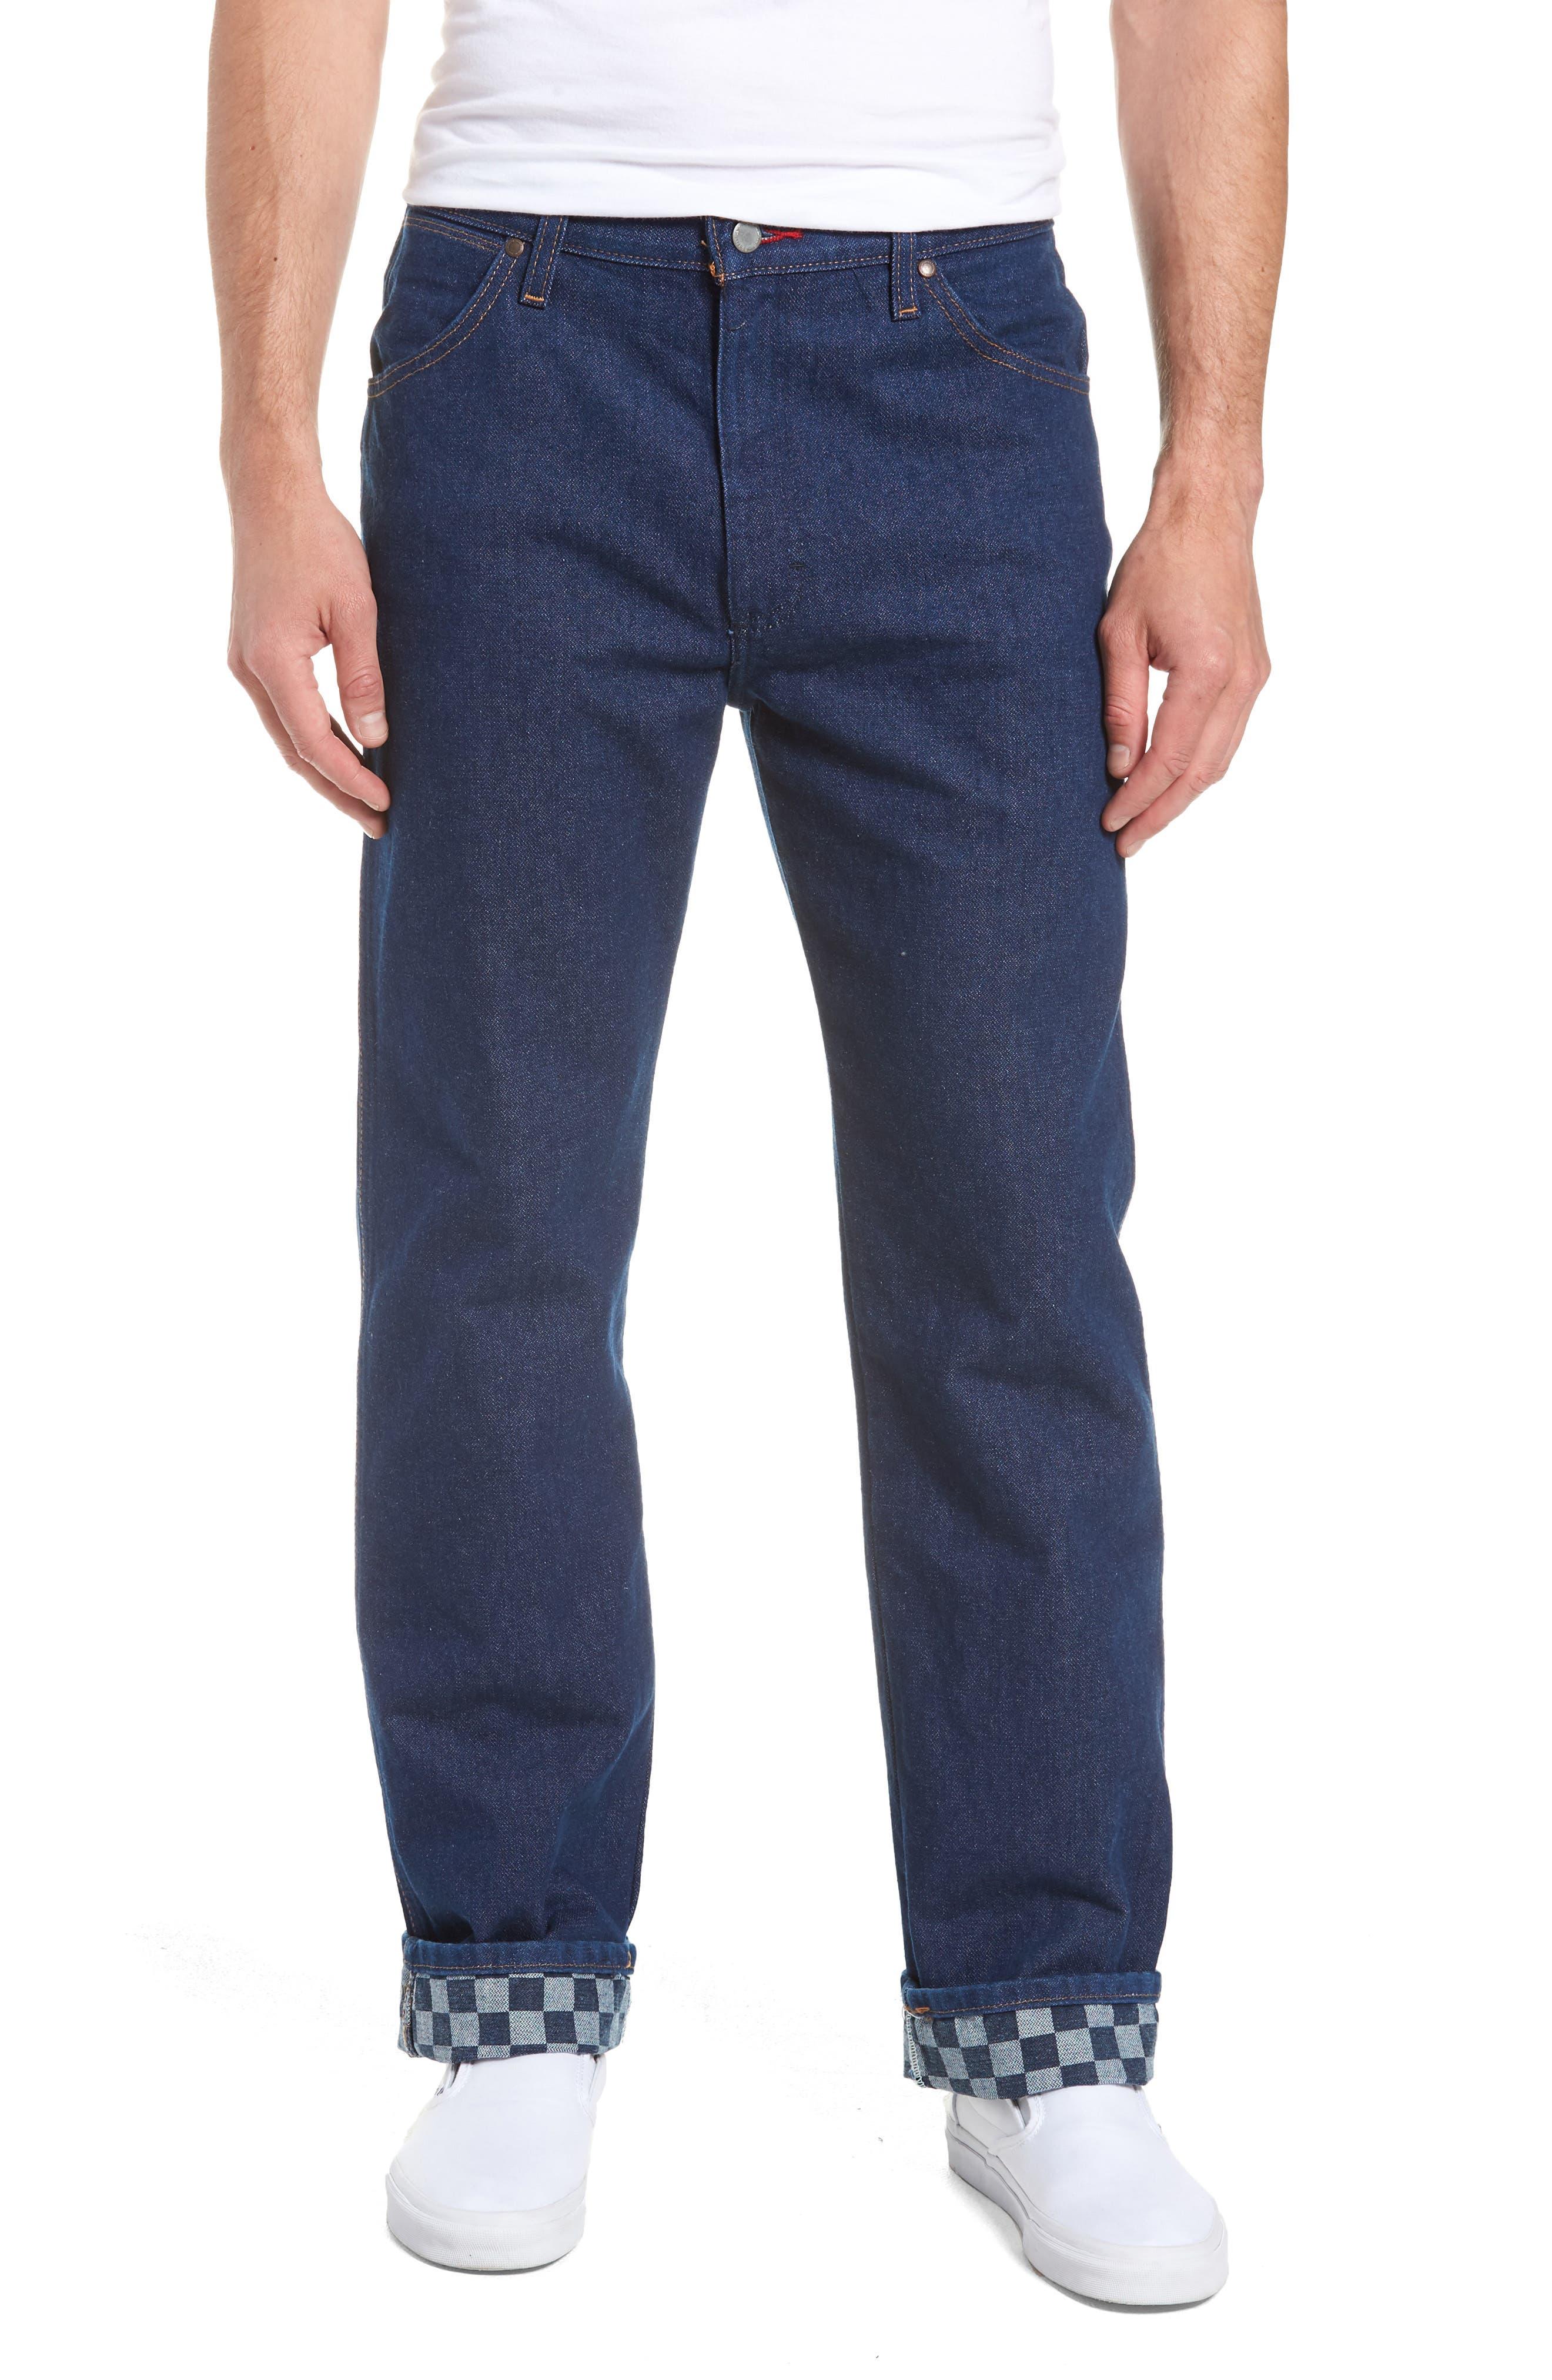 x Wrangler Straight Leg Jeans,                             Main thumbnail 1, color,                             PREWASH INDIGO